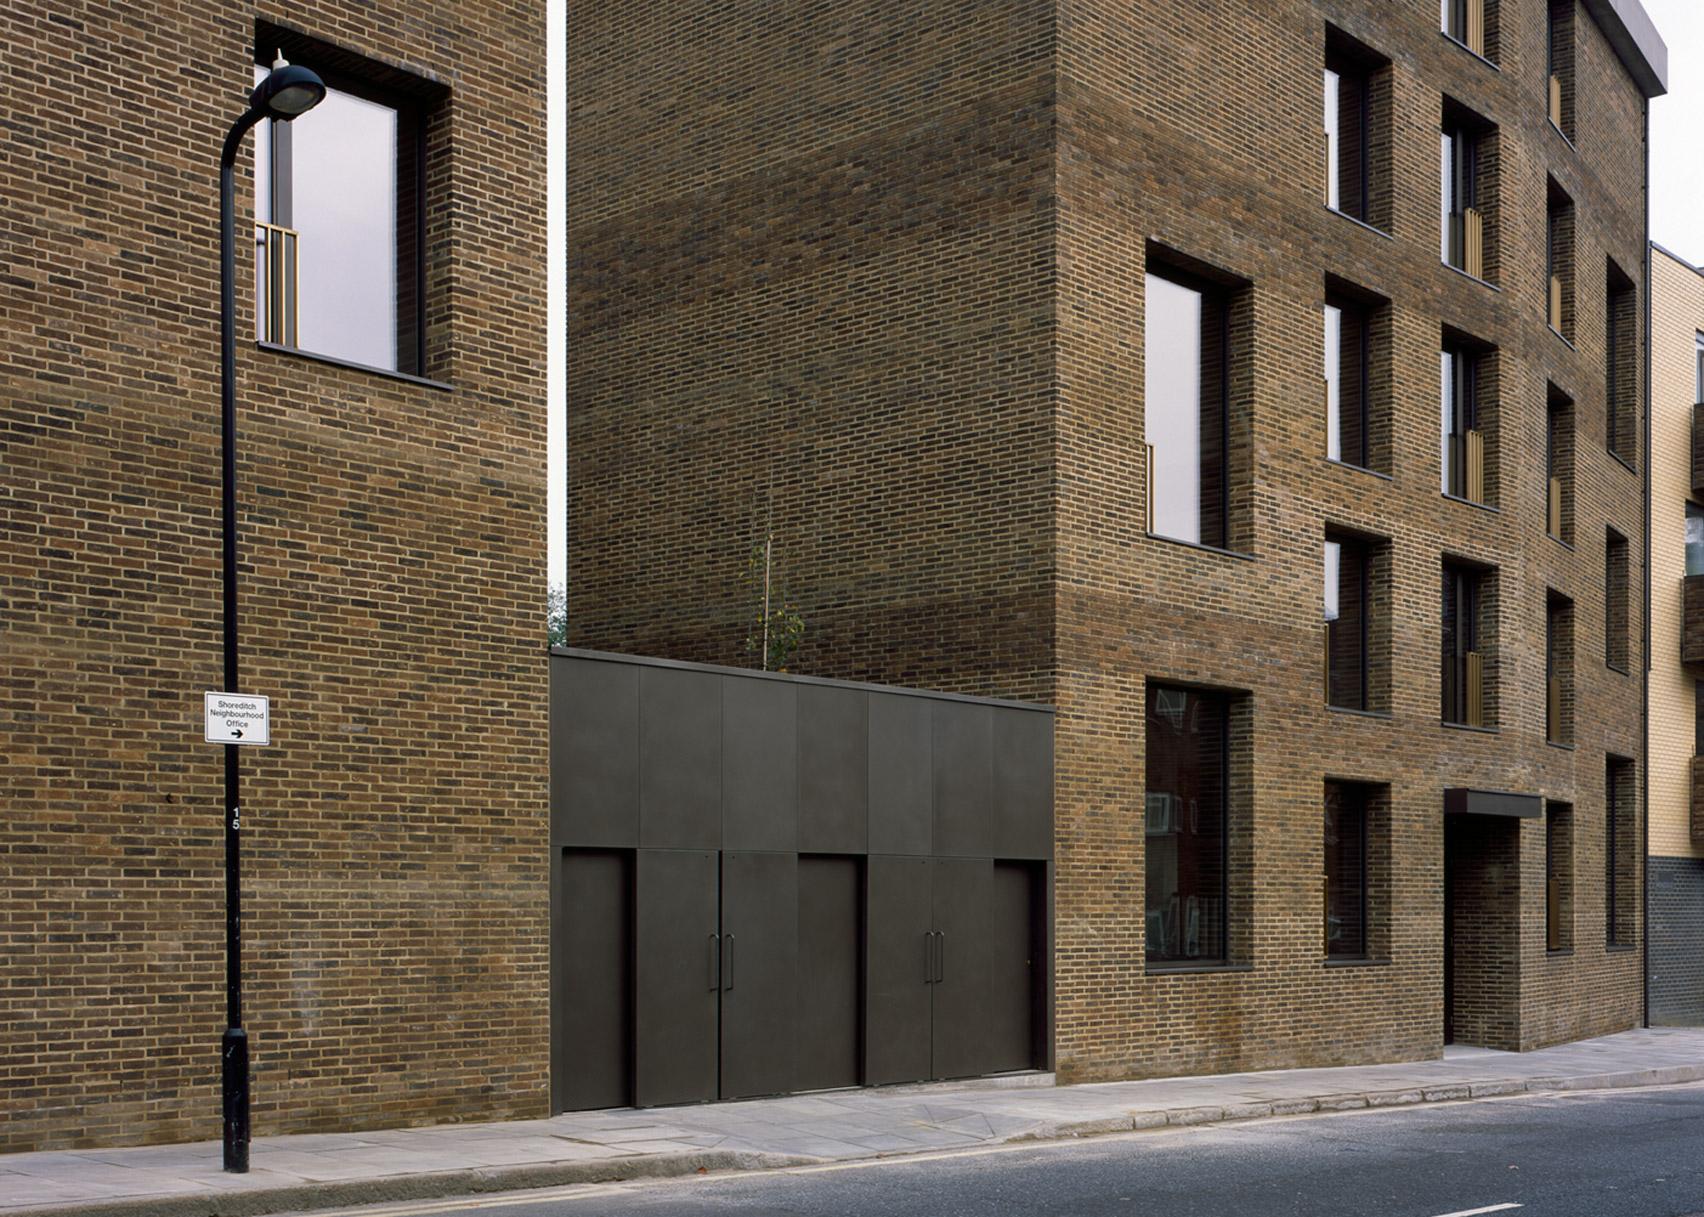 Shepherdess Walk Housing, London, by Jaccaud Zein Architect